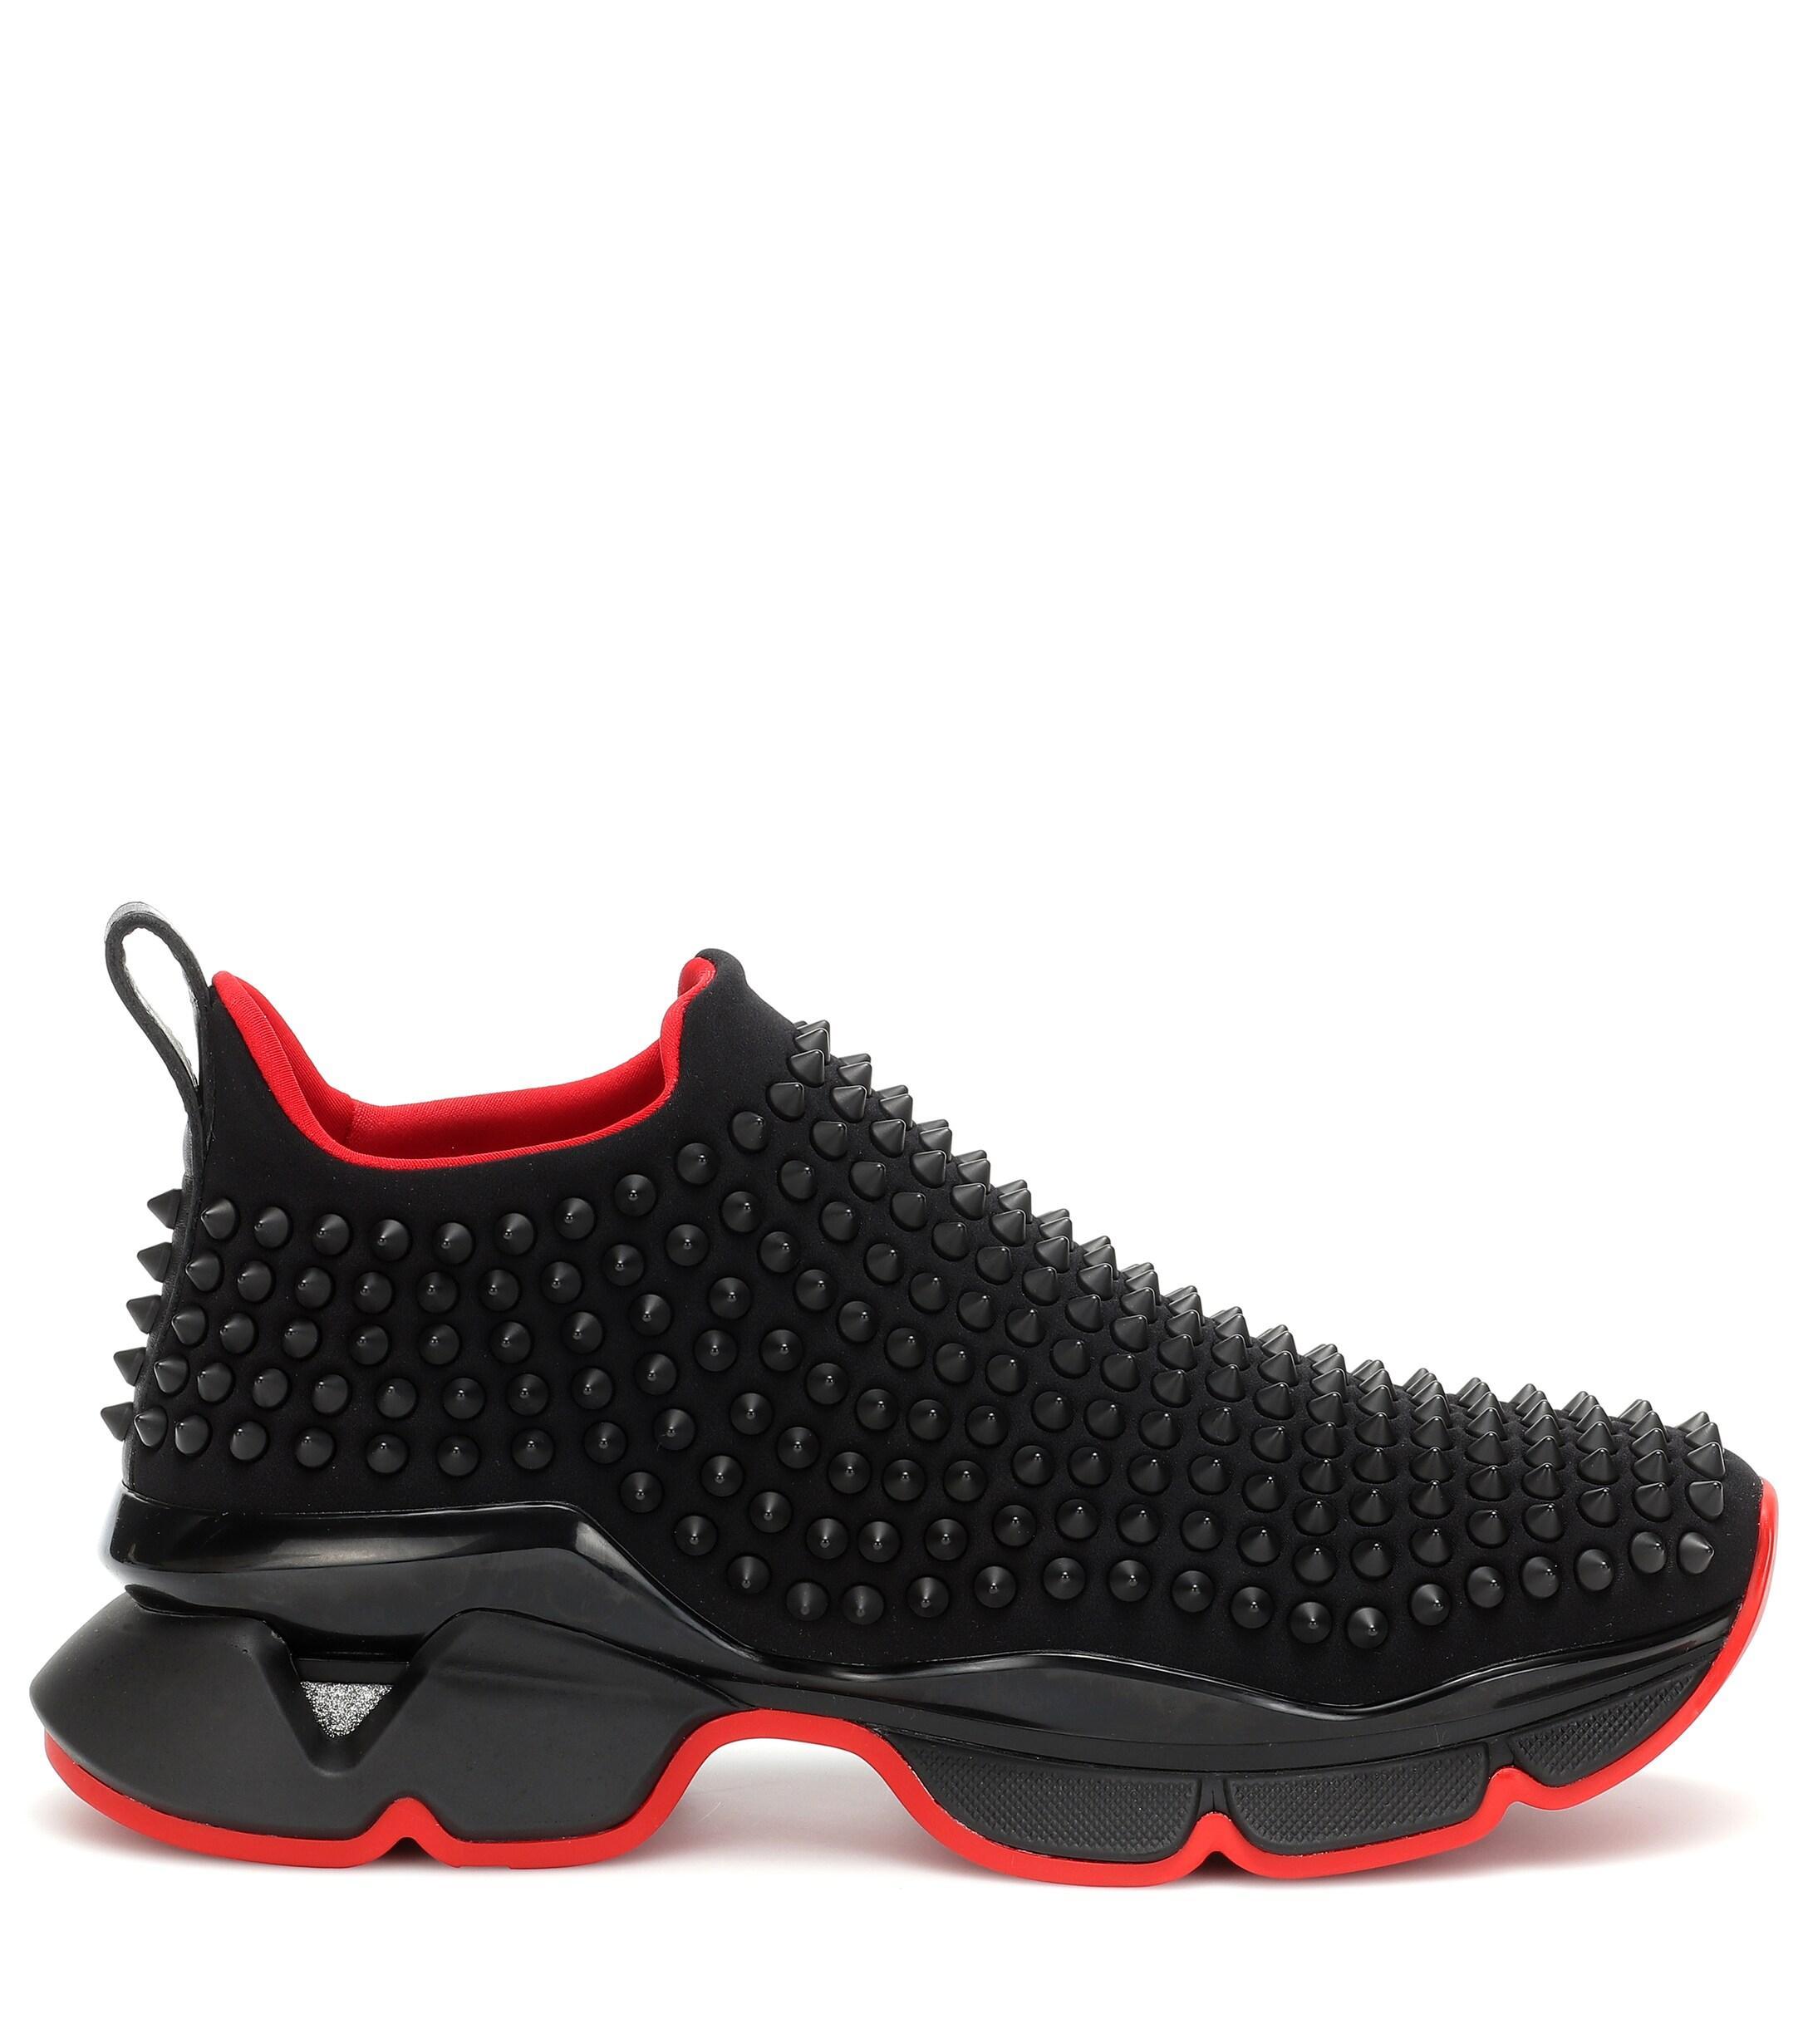 Christian Louboutin Spike Sock Sneakers